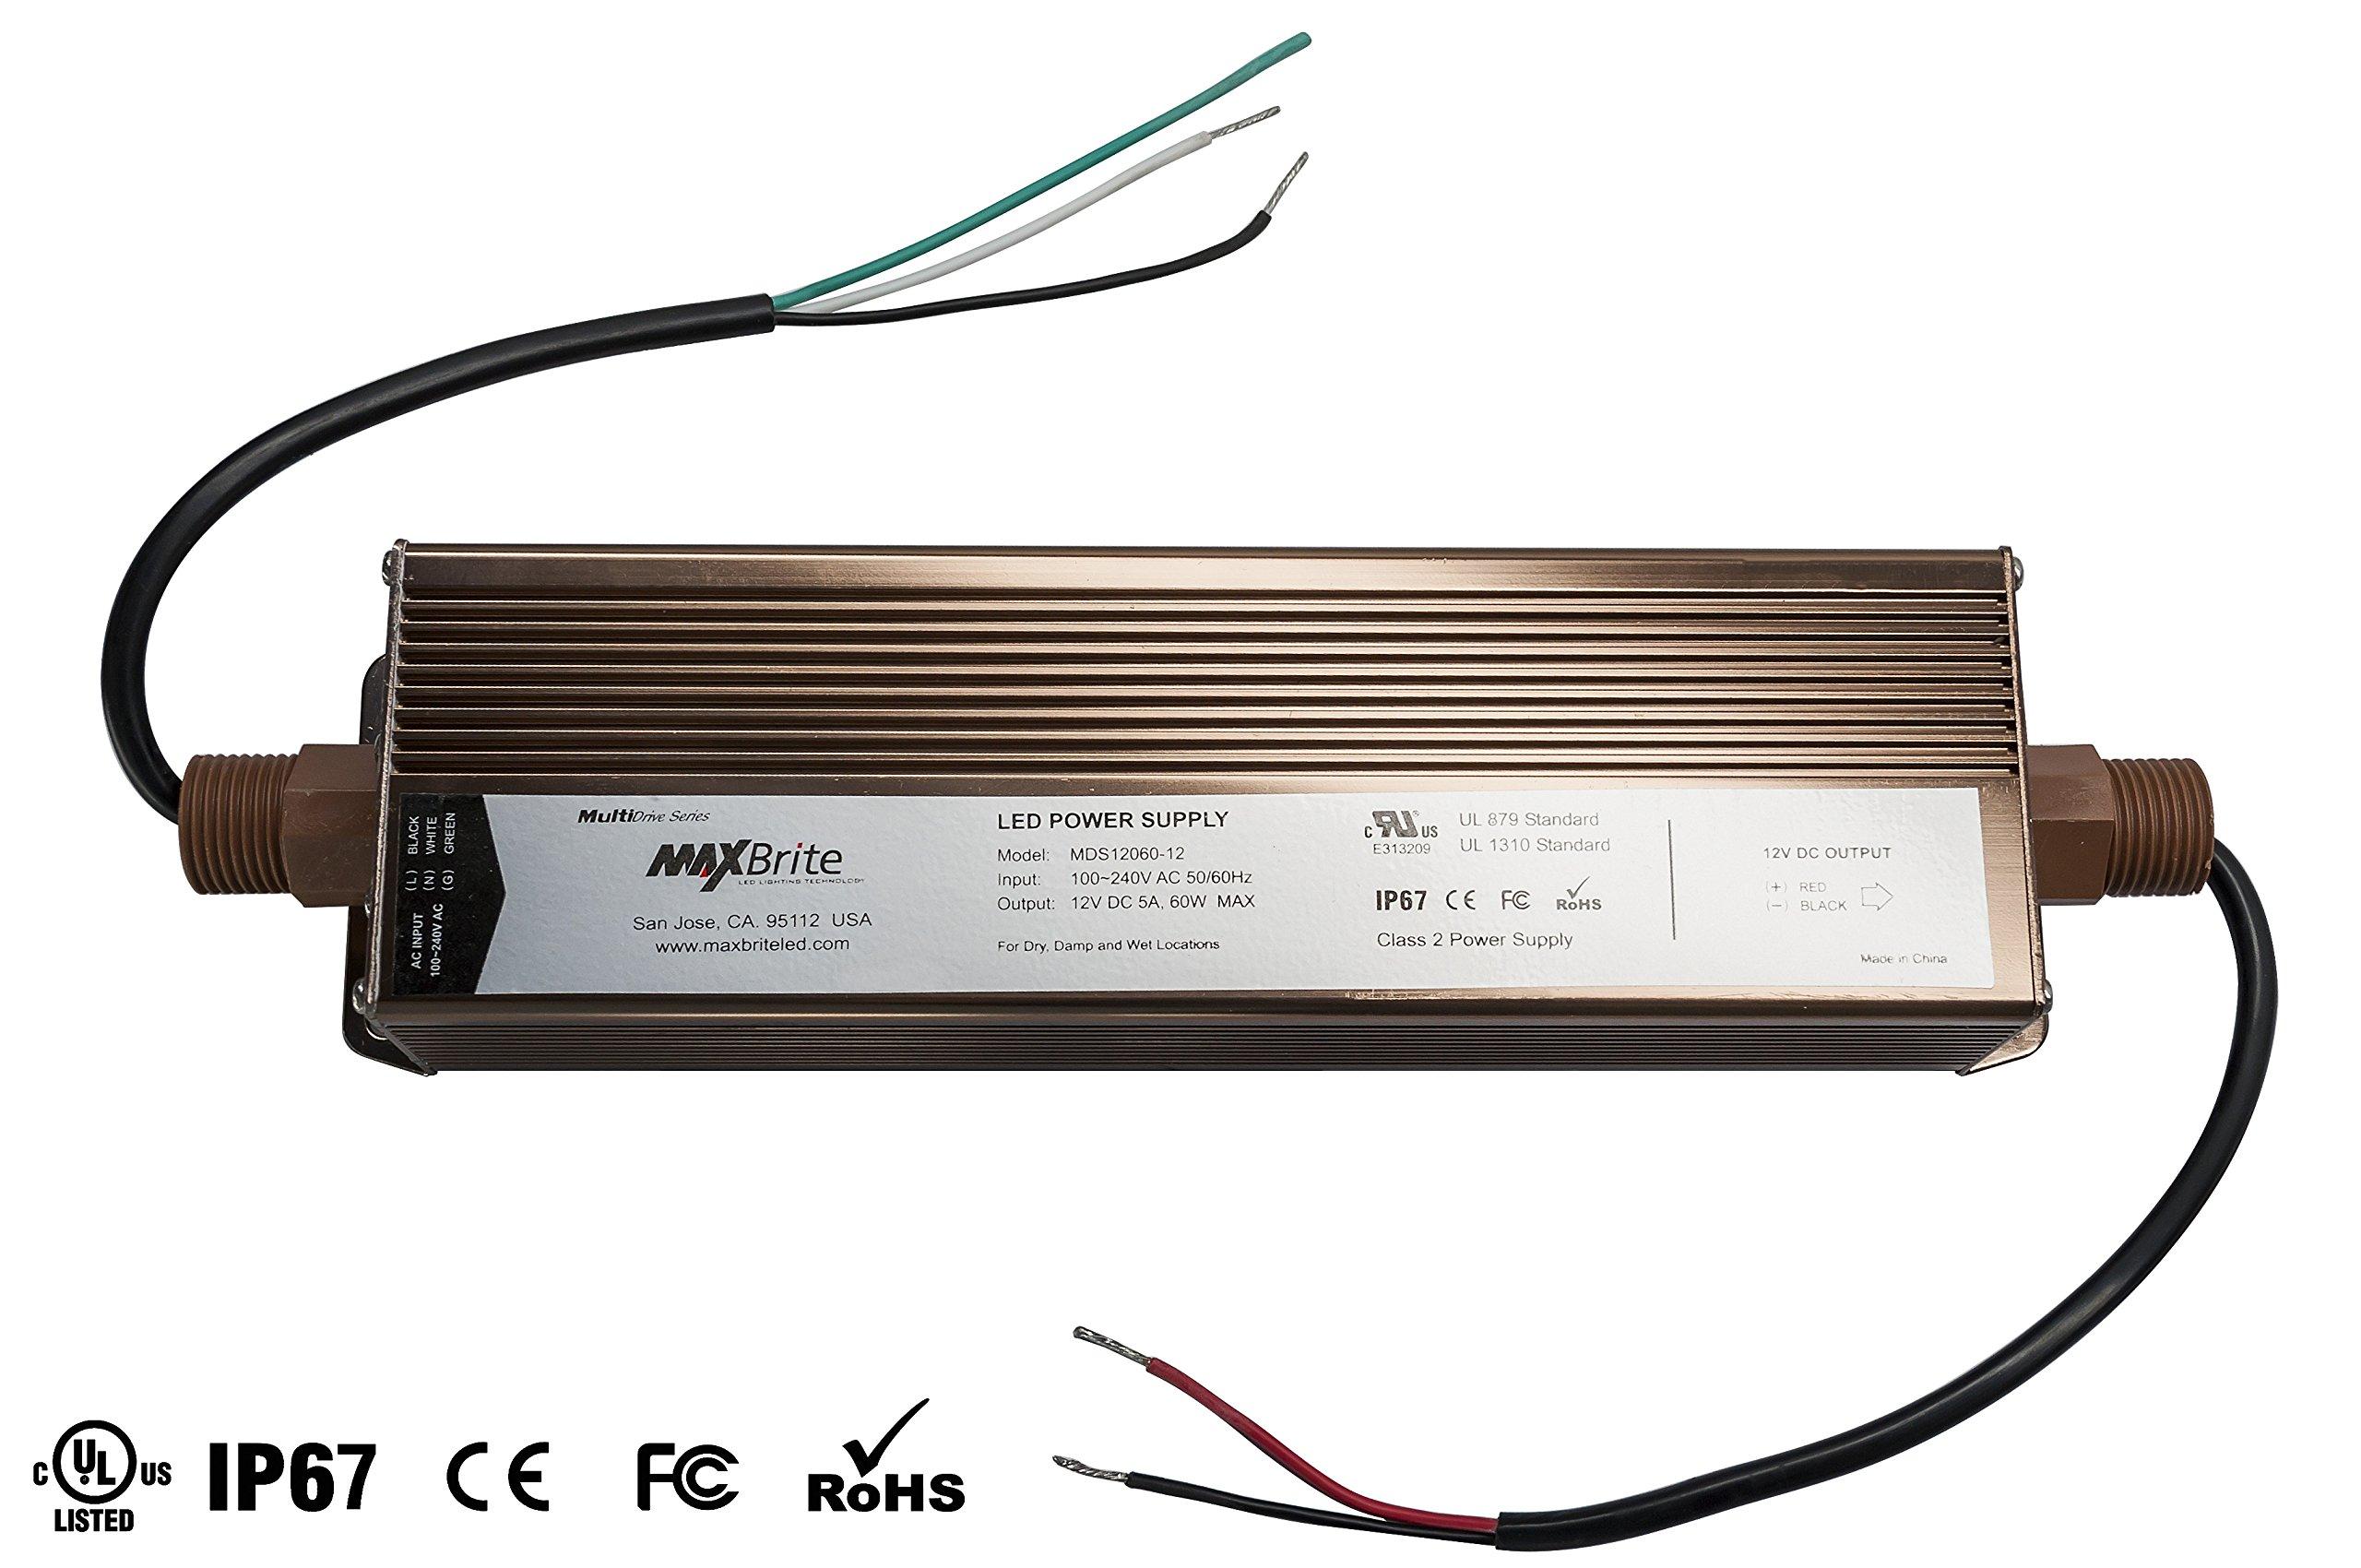 60W LED POWER SUPPLY, 12V DC Output, 100-240V AC Input, IP67 Waterproof, UL/cUL Certified, CE, RoHS, Class 2